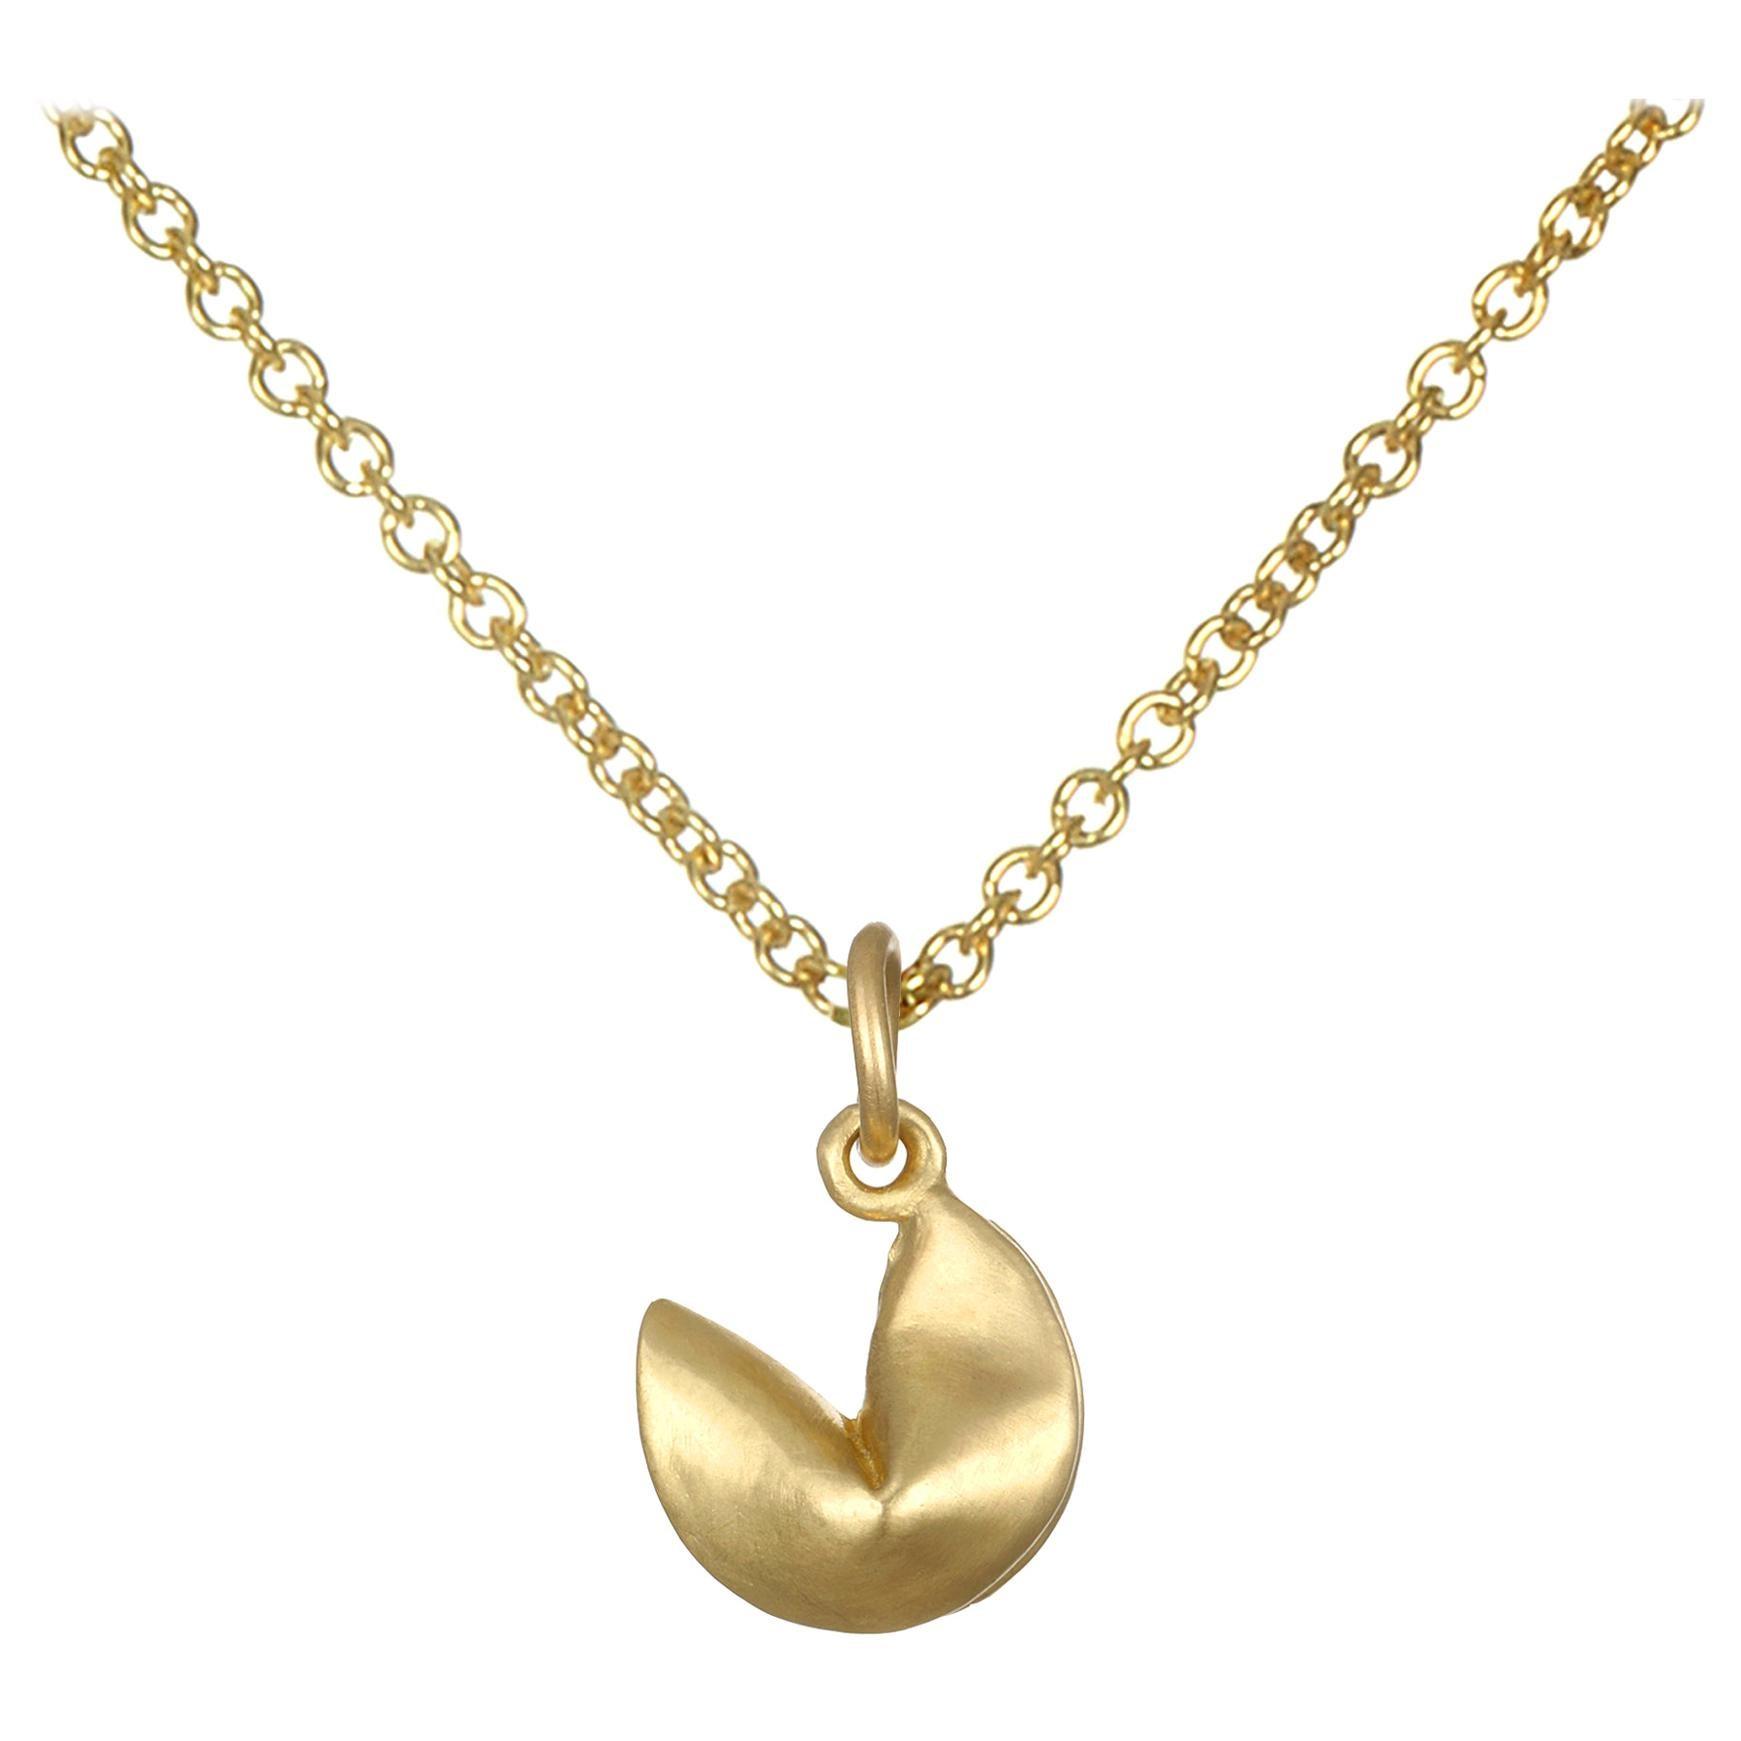 Faye Kim 18 Karat Gold Fortune Cookie Necklace